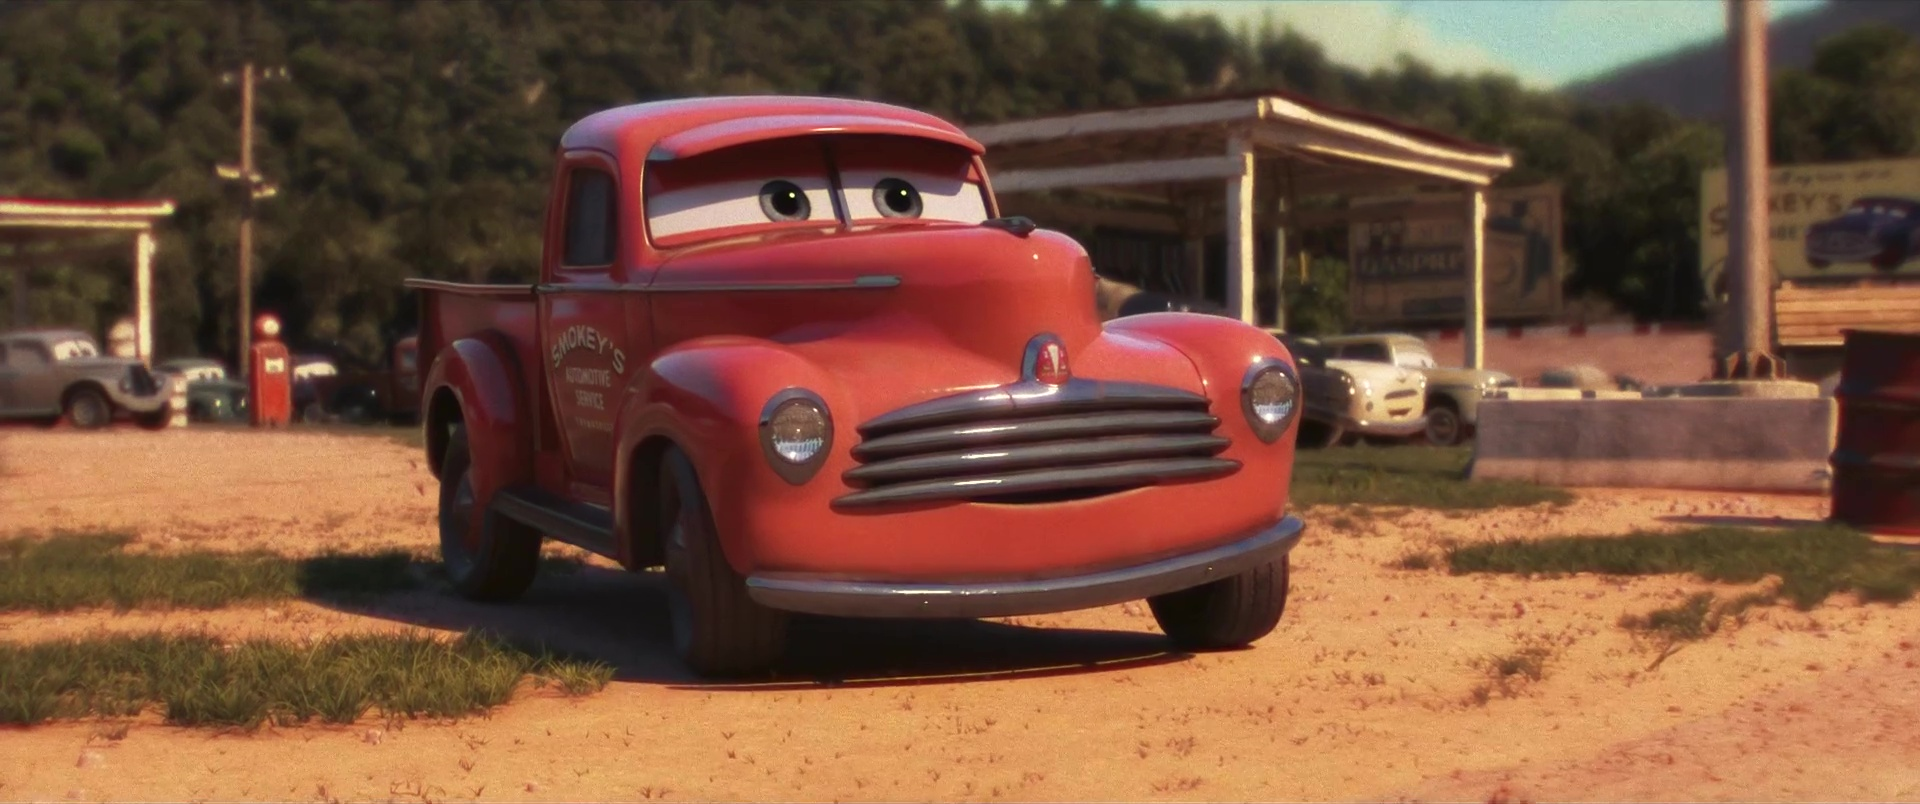 smokey-personnage-cars-3-02